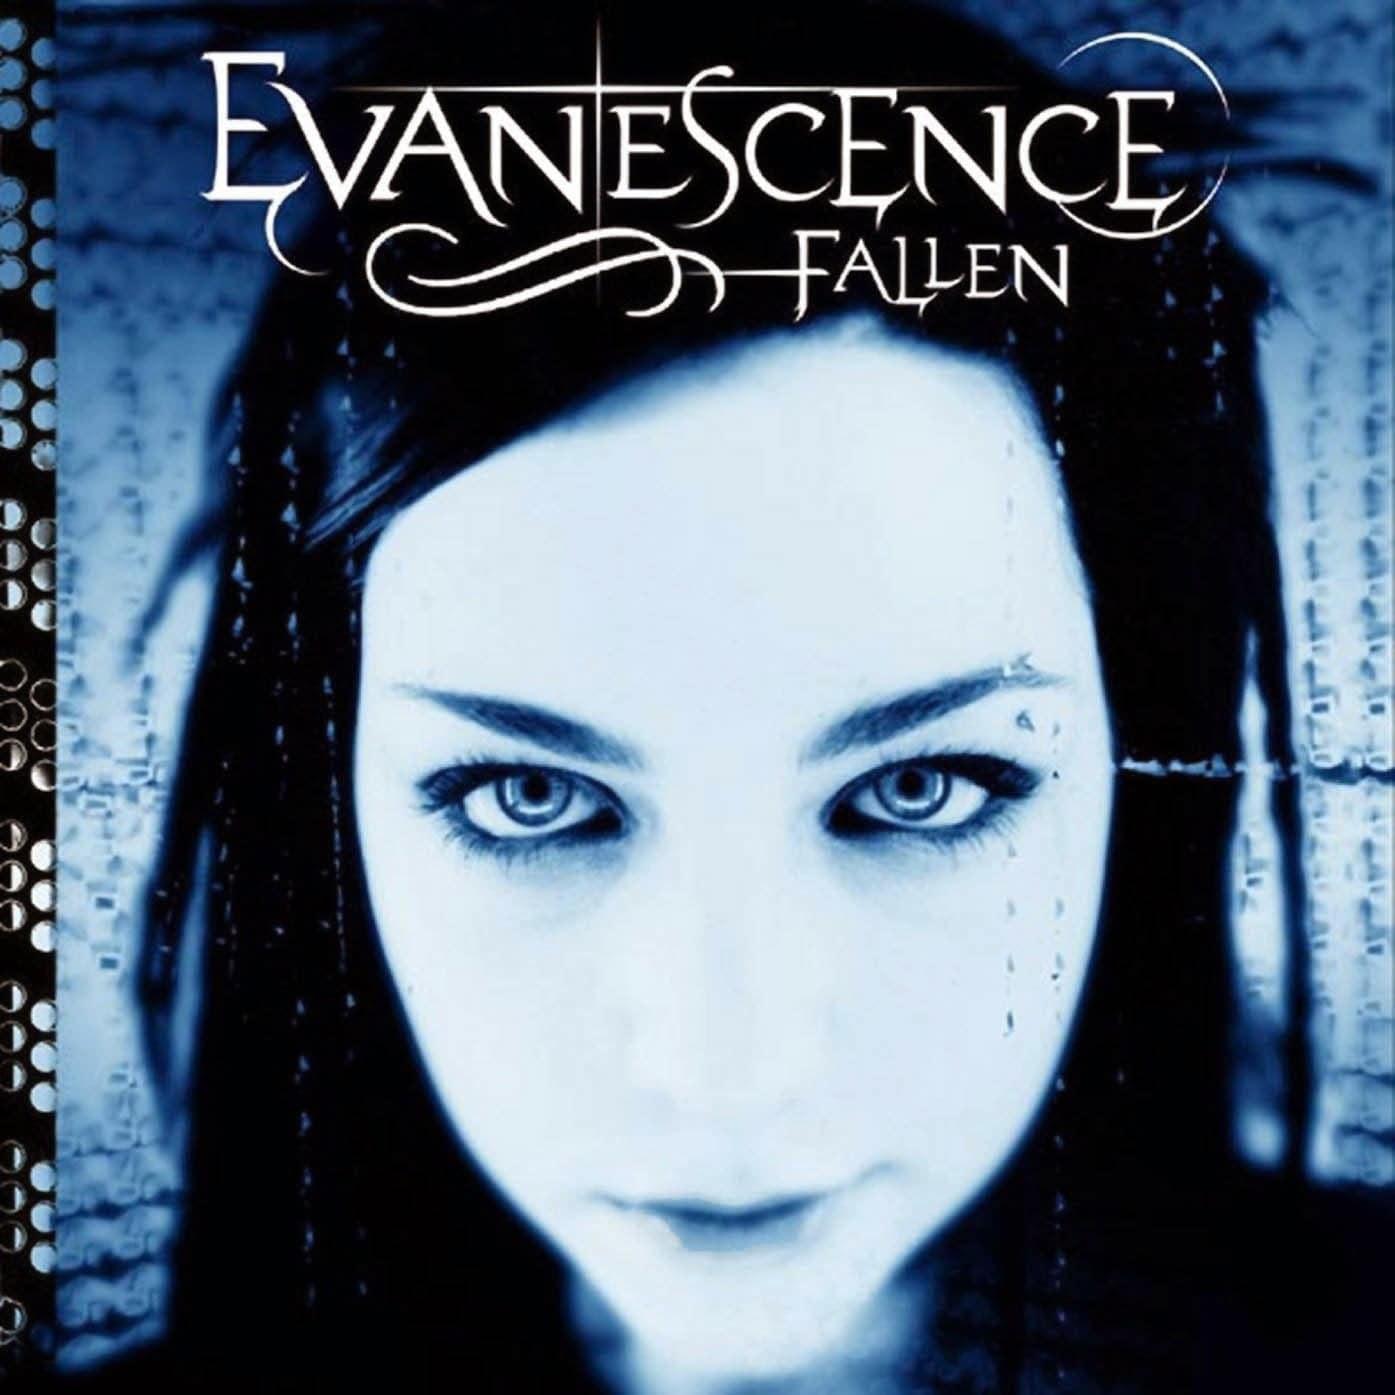 Evanescence - Fallen (2003)